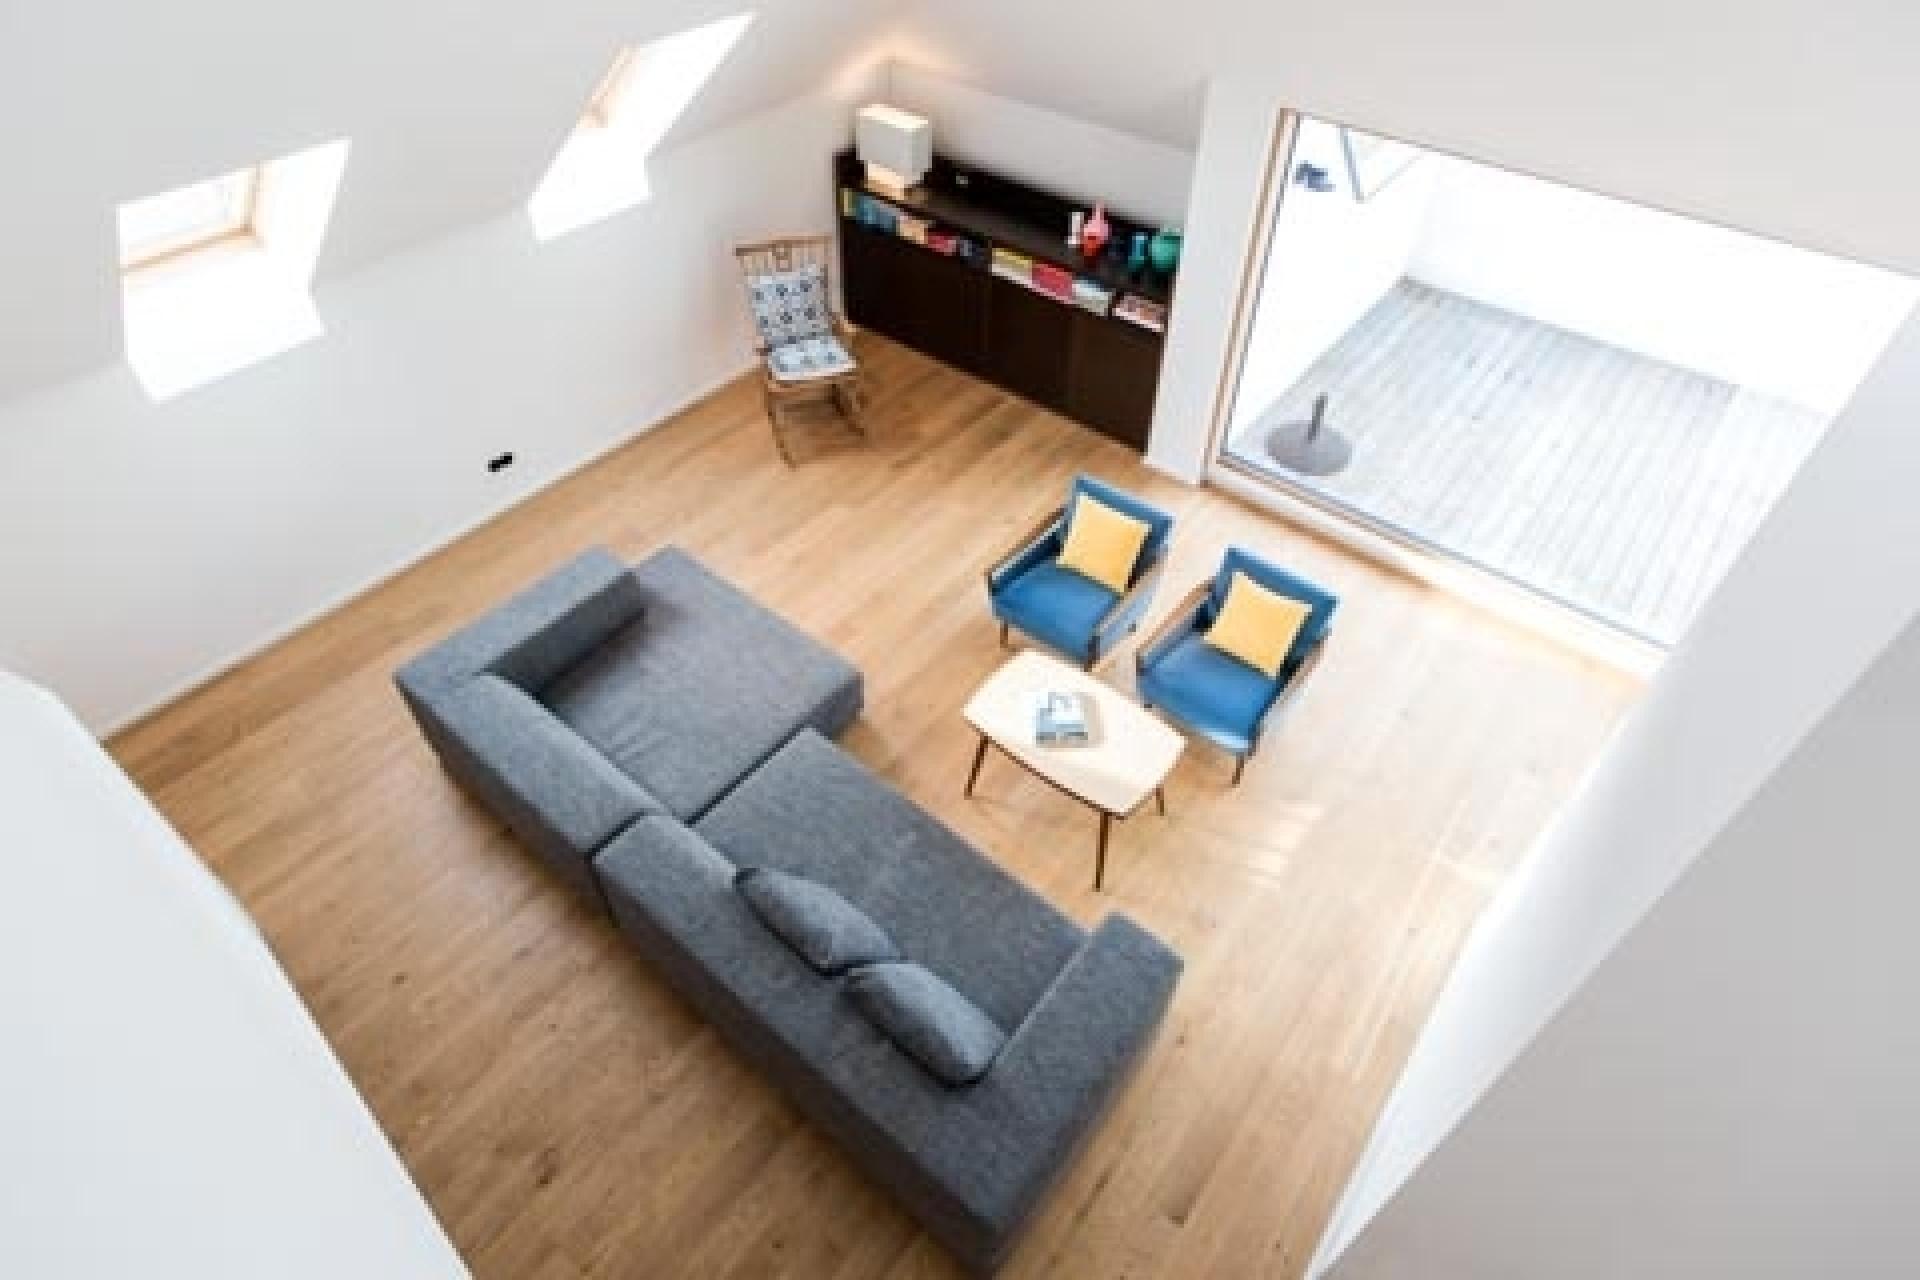 Immobilien Fotografie mit Erika Mayer - Canon Academy Spezialthemen